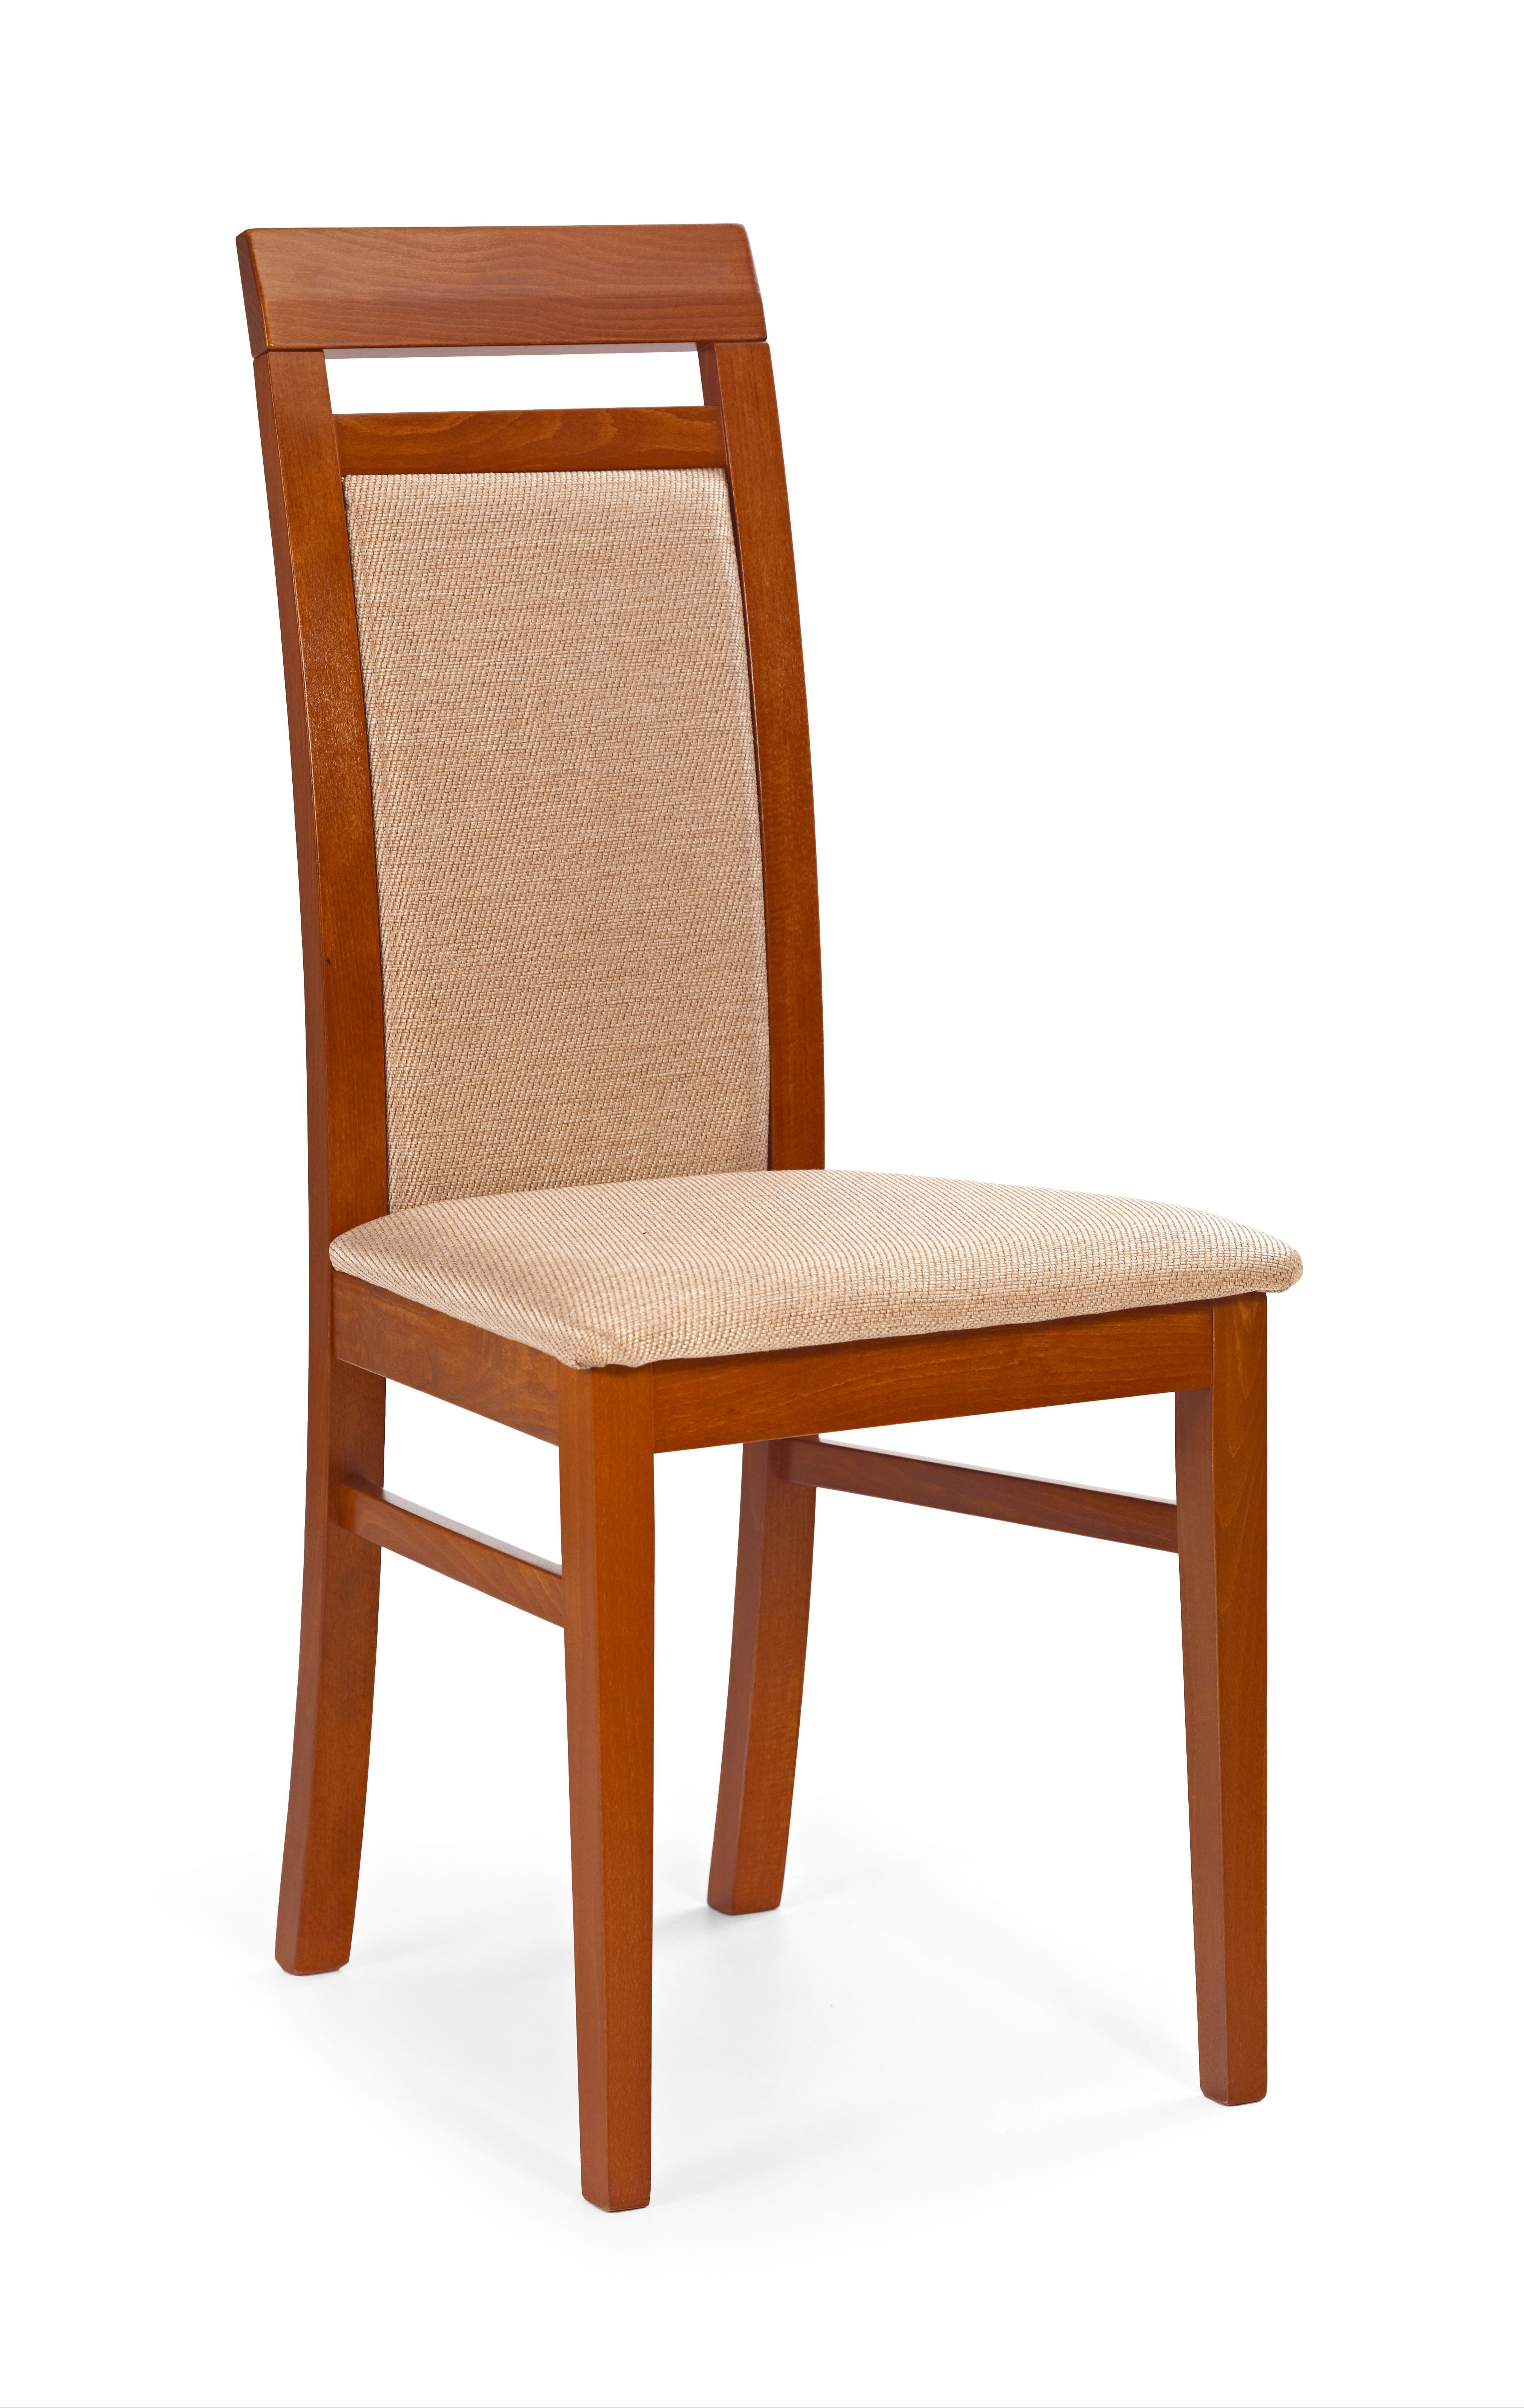 Kėdė ALBERT vyšnia